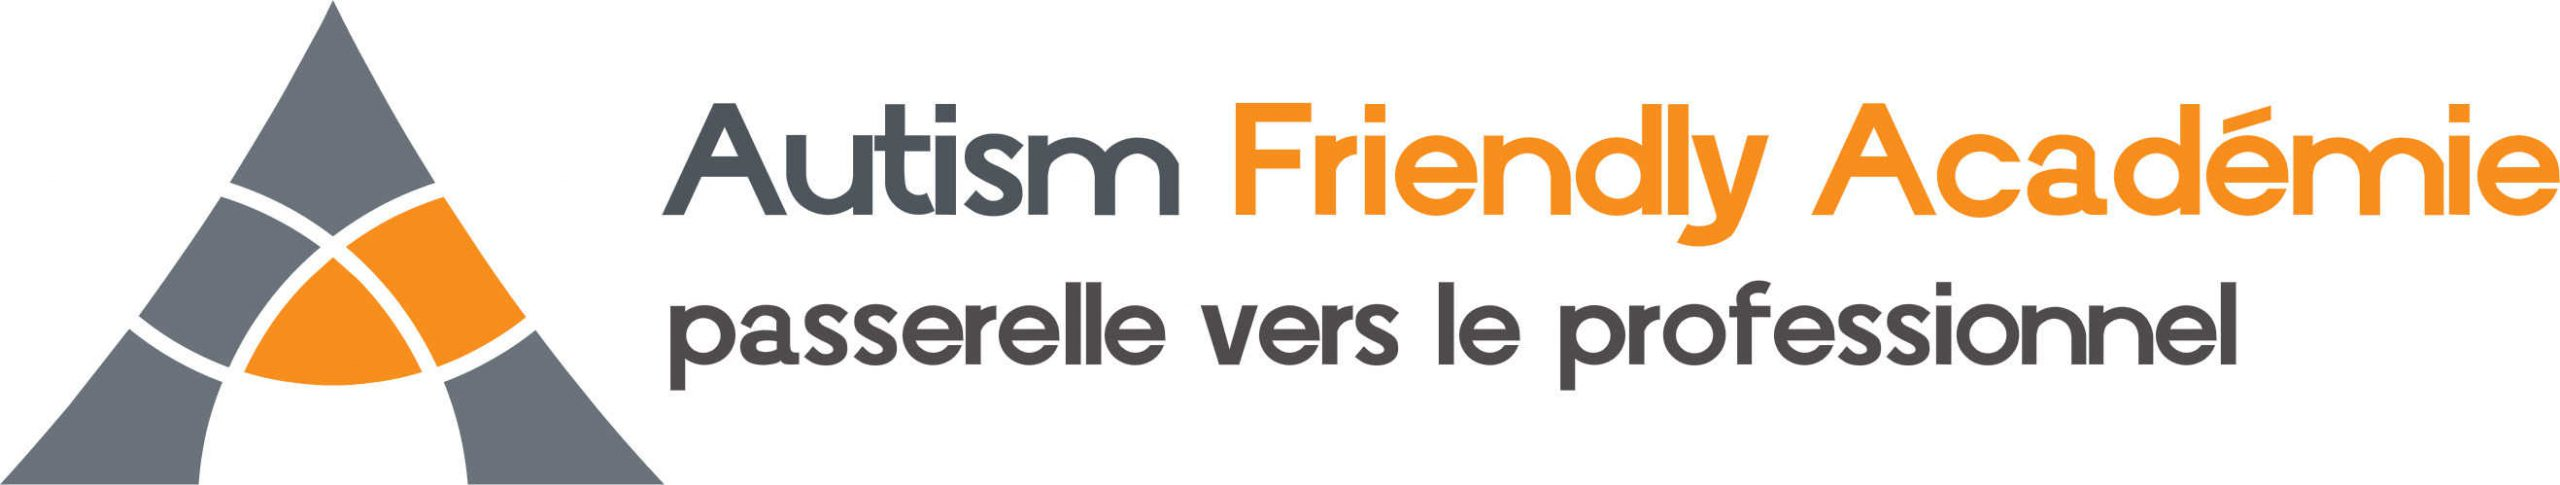 logo autism friendly académie